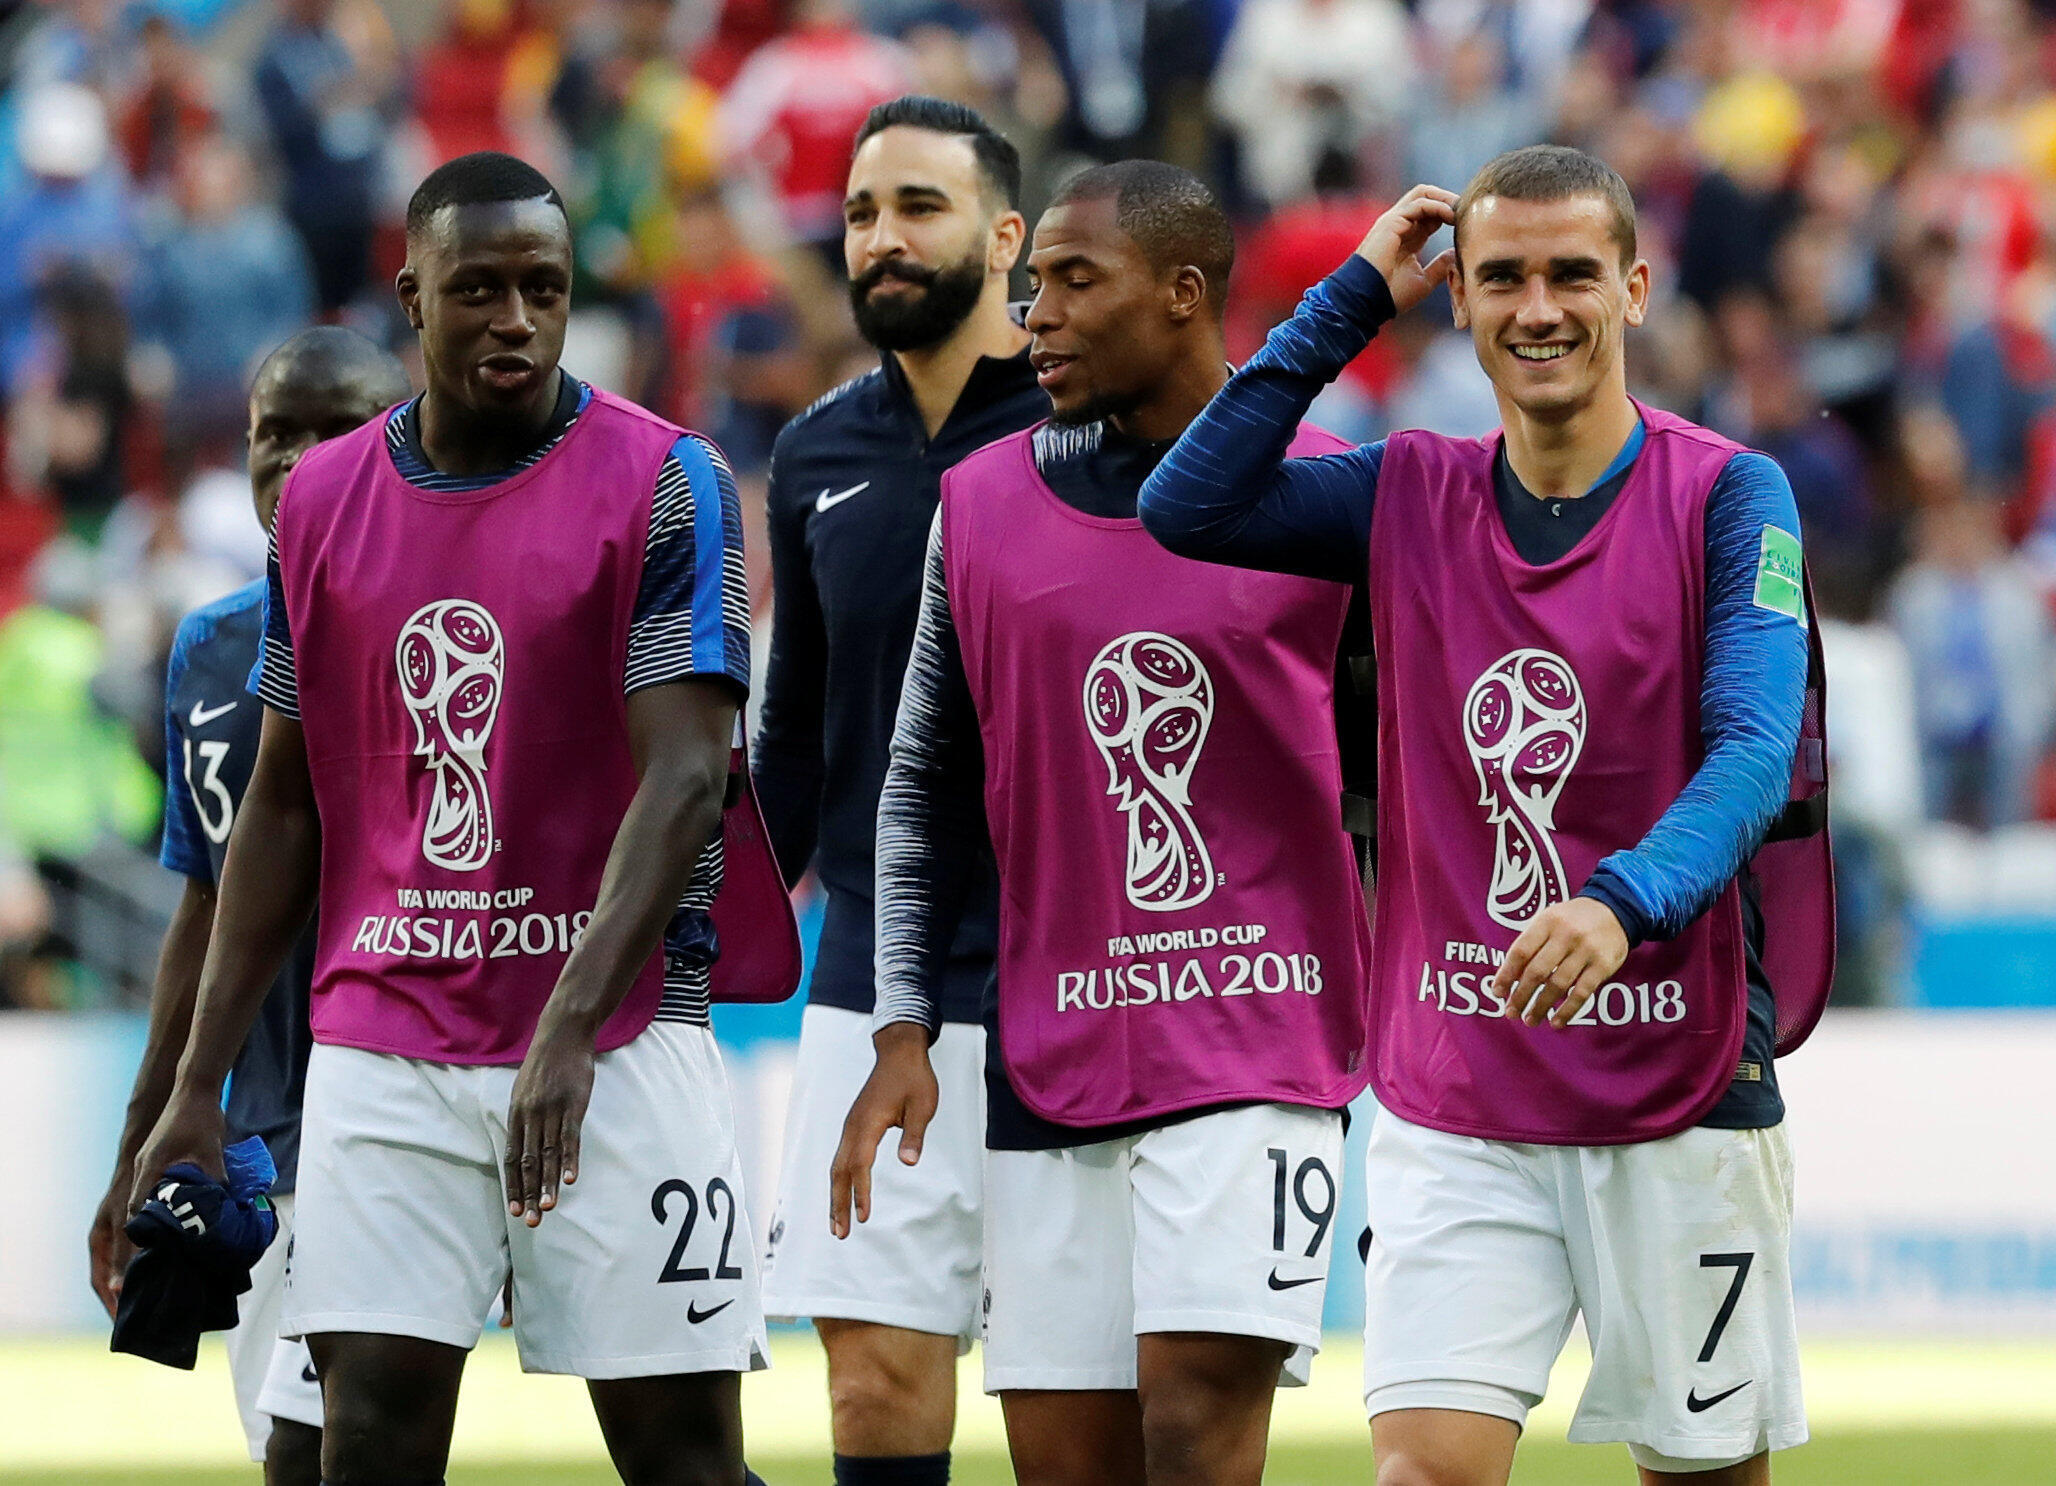 France's Benjamin Mendy, Adil Rami, Djibril Sidibe and Antoine Griezmann celebrate after the match